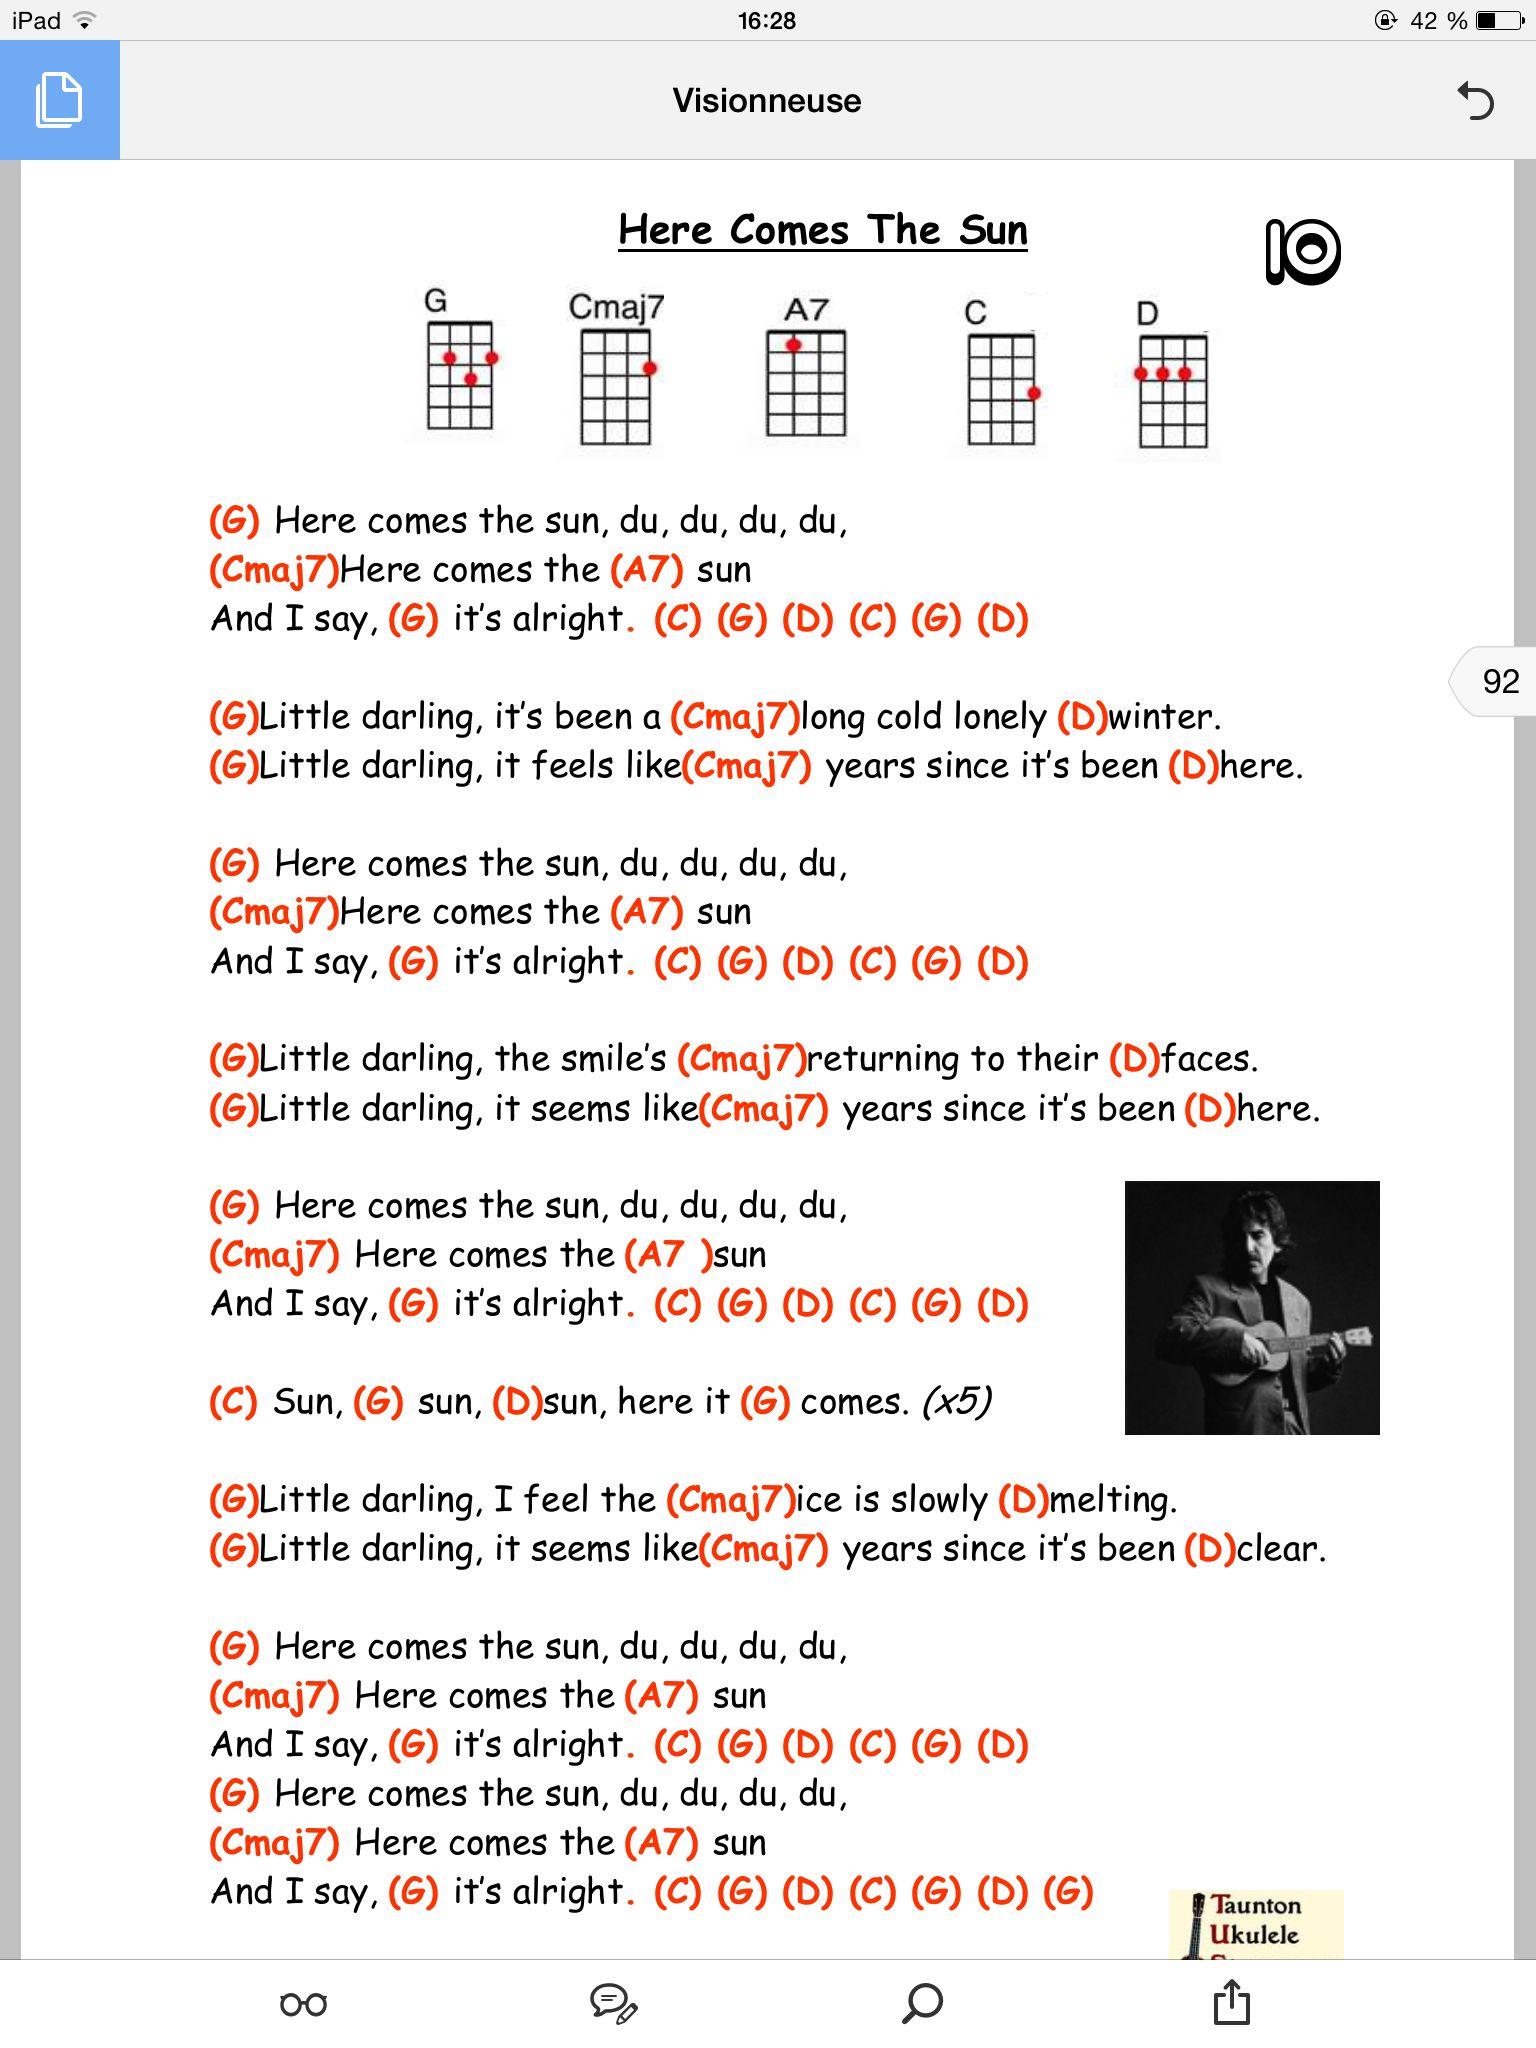 Here comes the sun pinteres here comes the sun beatles lyrics ukulele chord chart hexwebz Choice Image